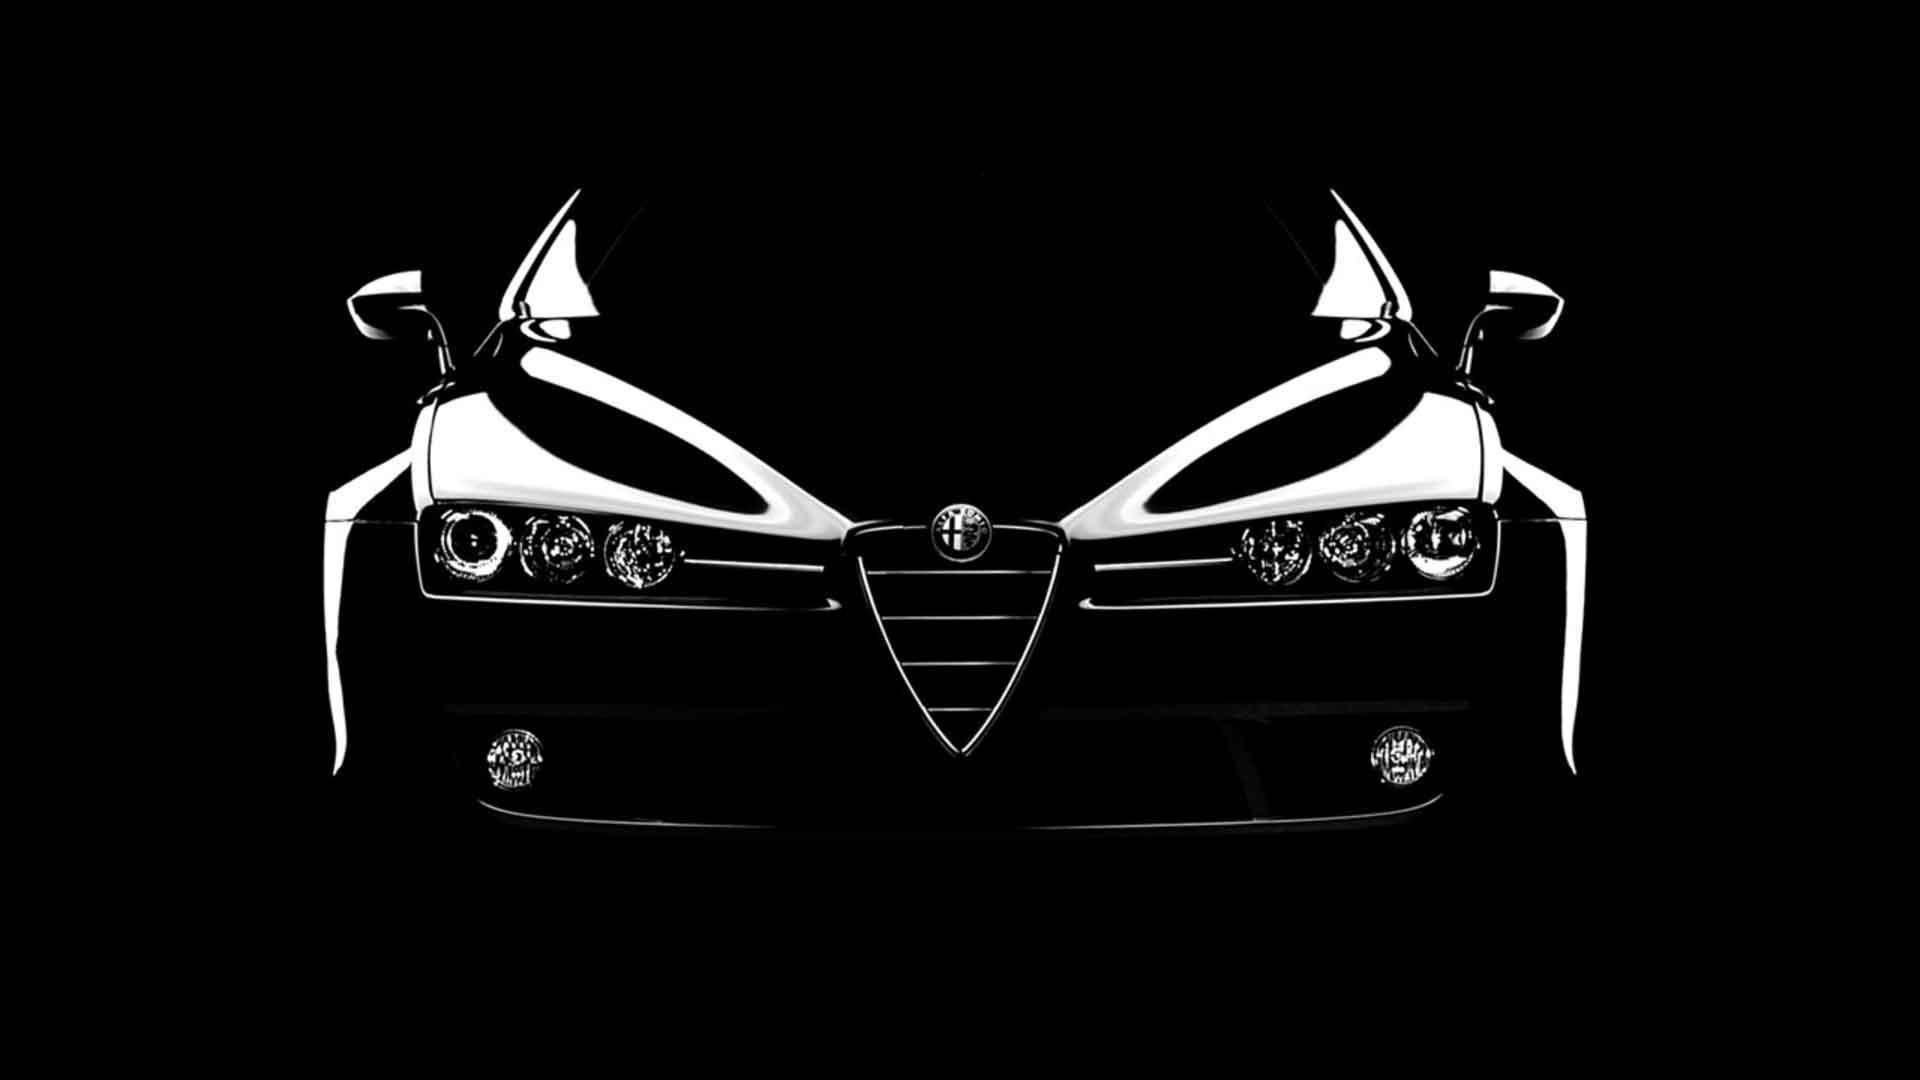 Alfa Romeo 159 Wallpaper 5   1920 X 1080 stmednet 1920x1080